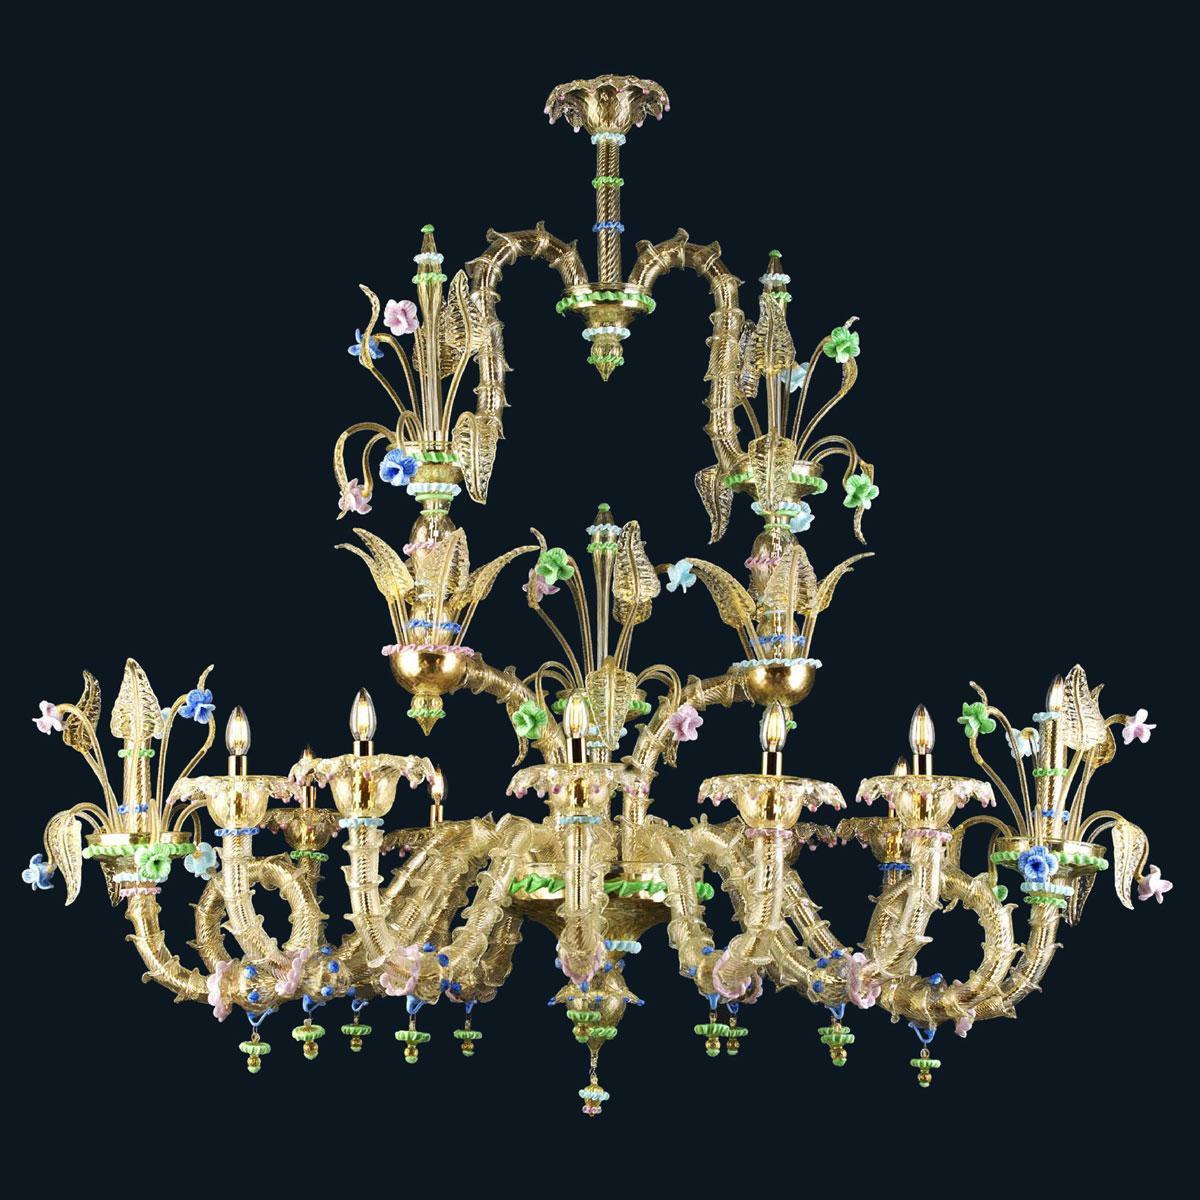 """Mea"" lustre en cristal de Murano - 12 lumières - or"